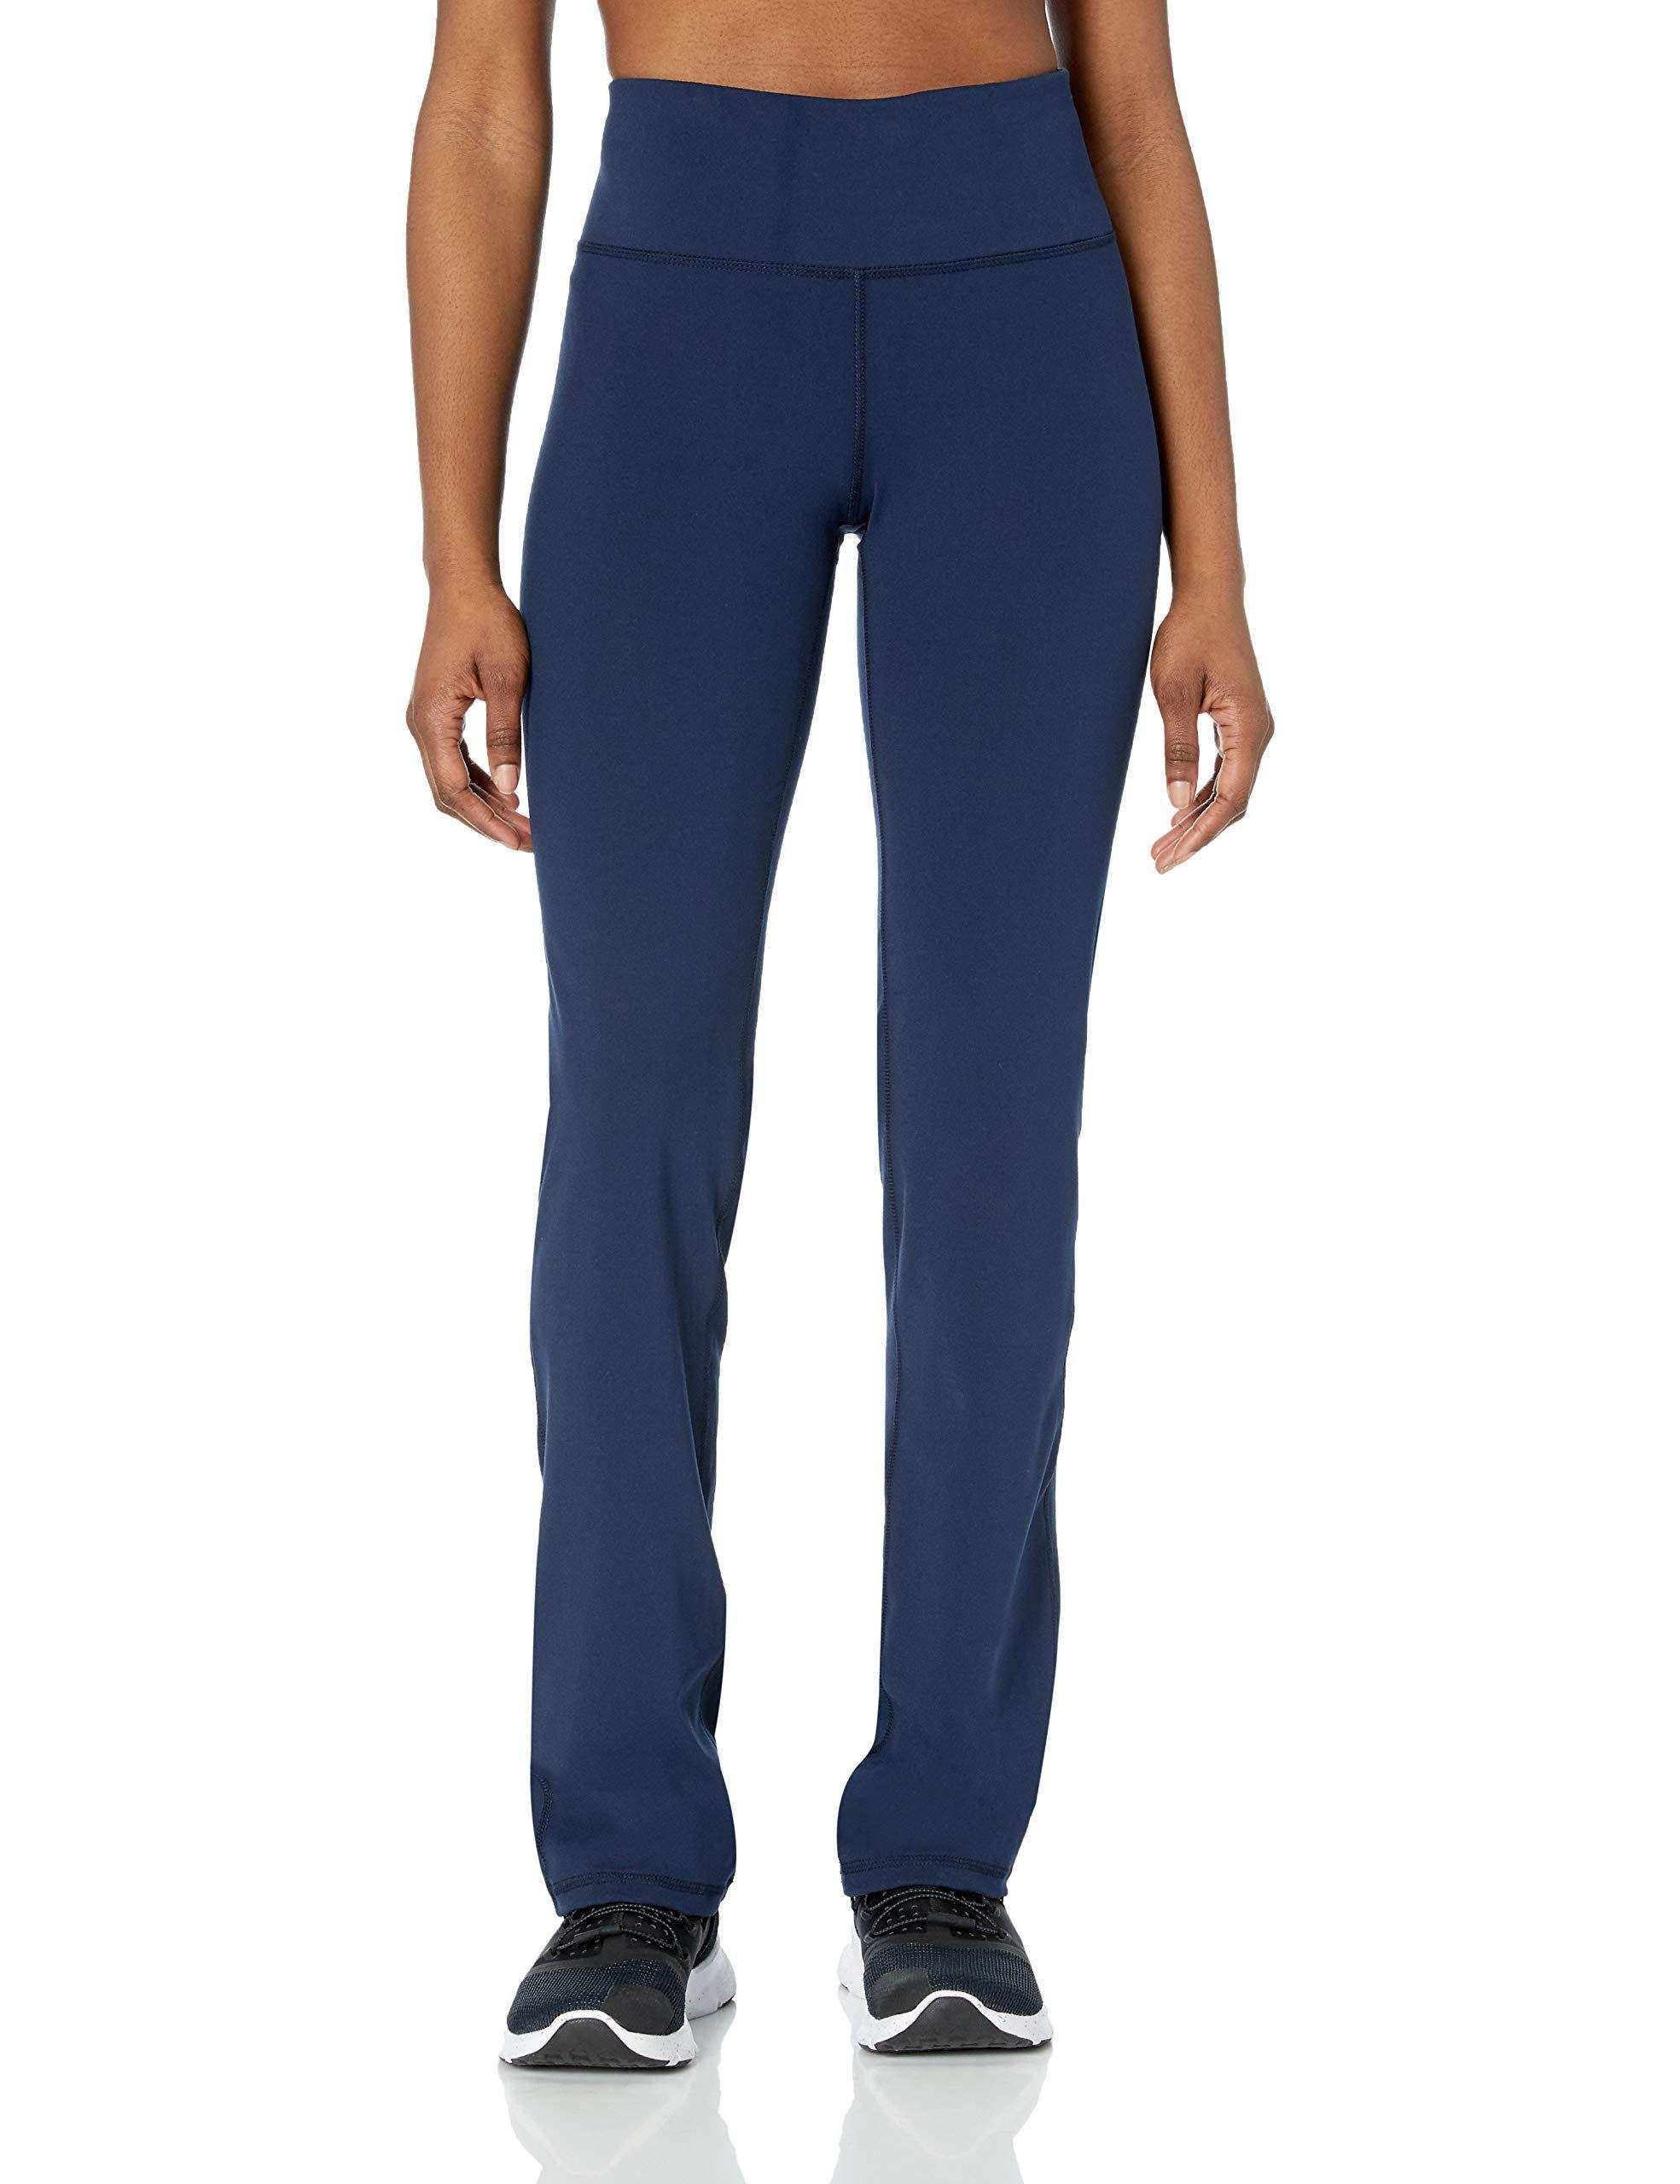 Amazon essentials womens bootcut x large yoga pants